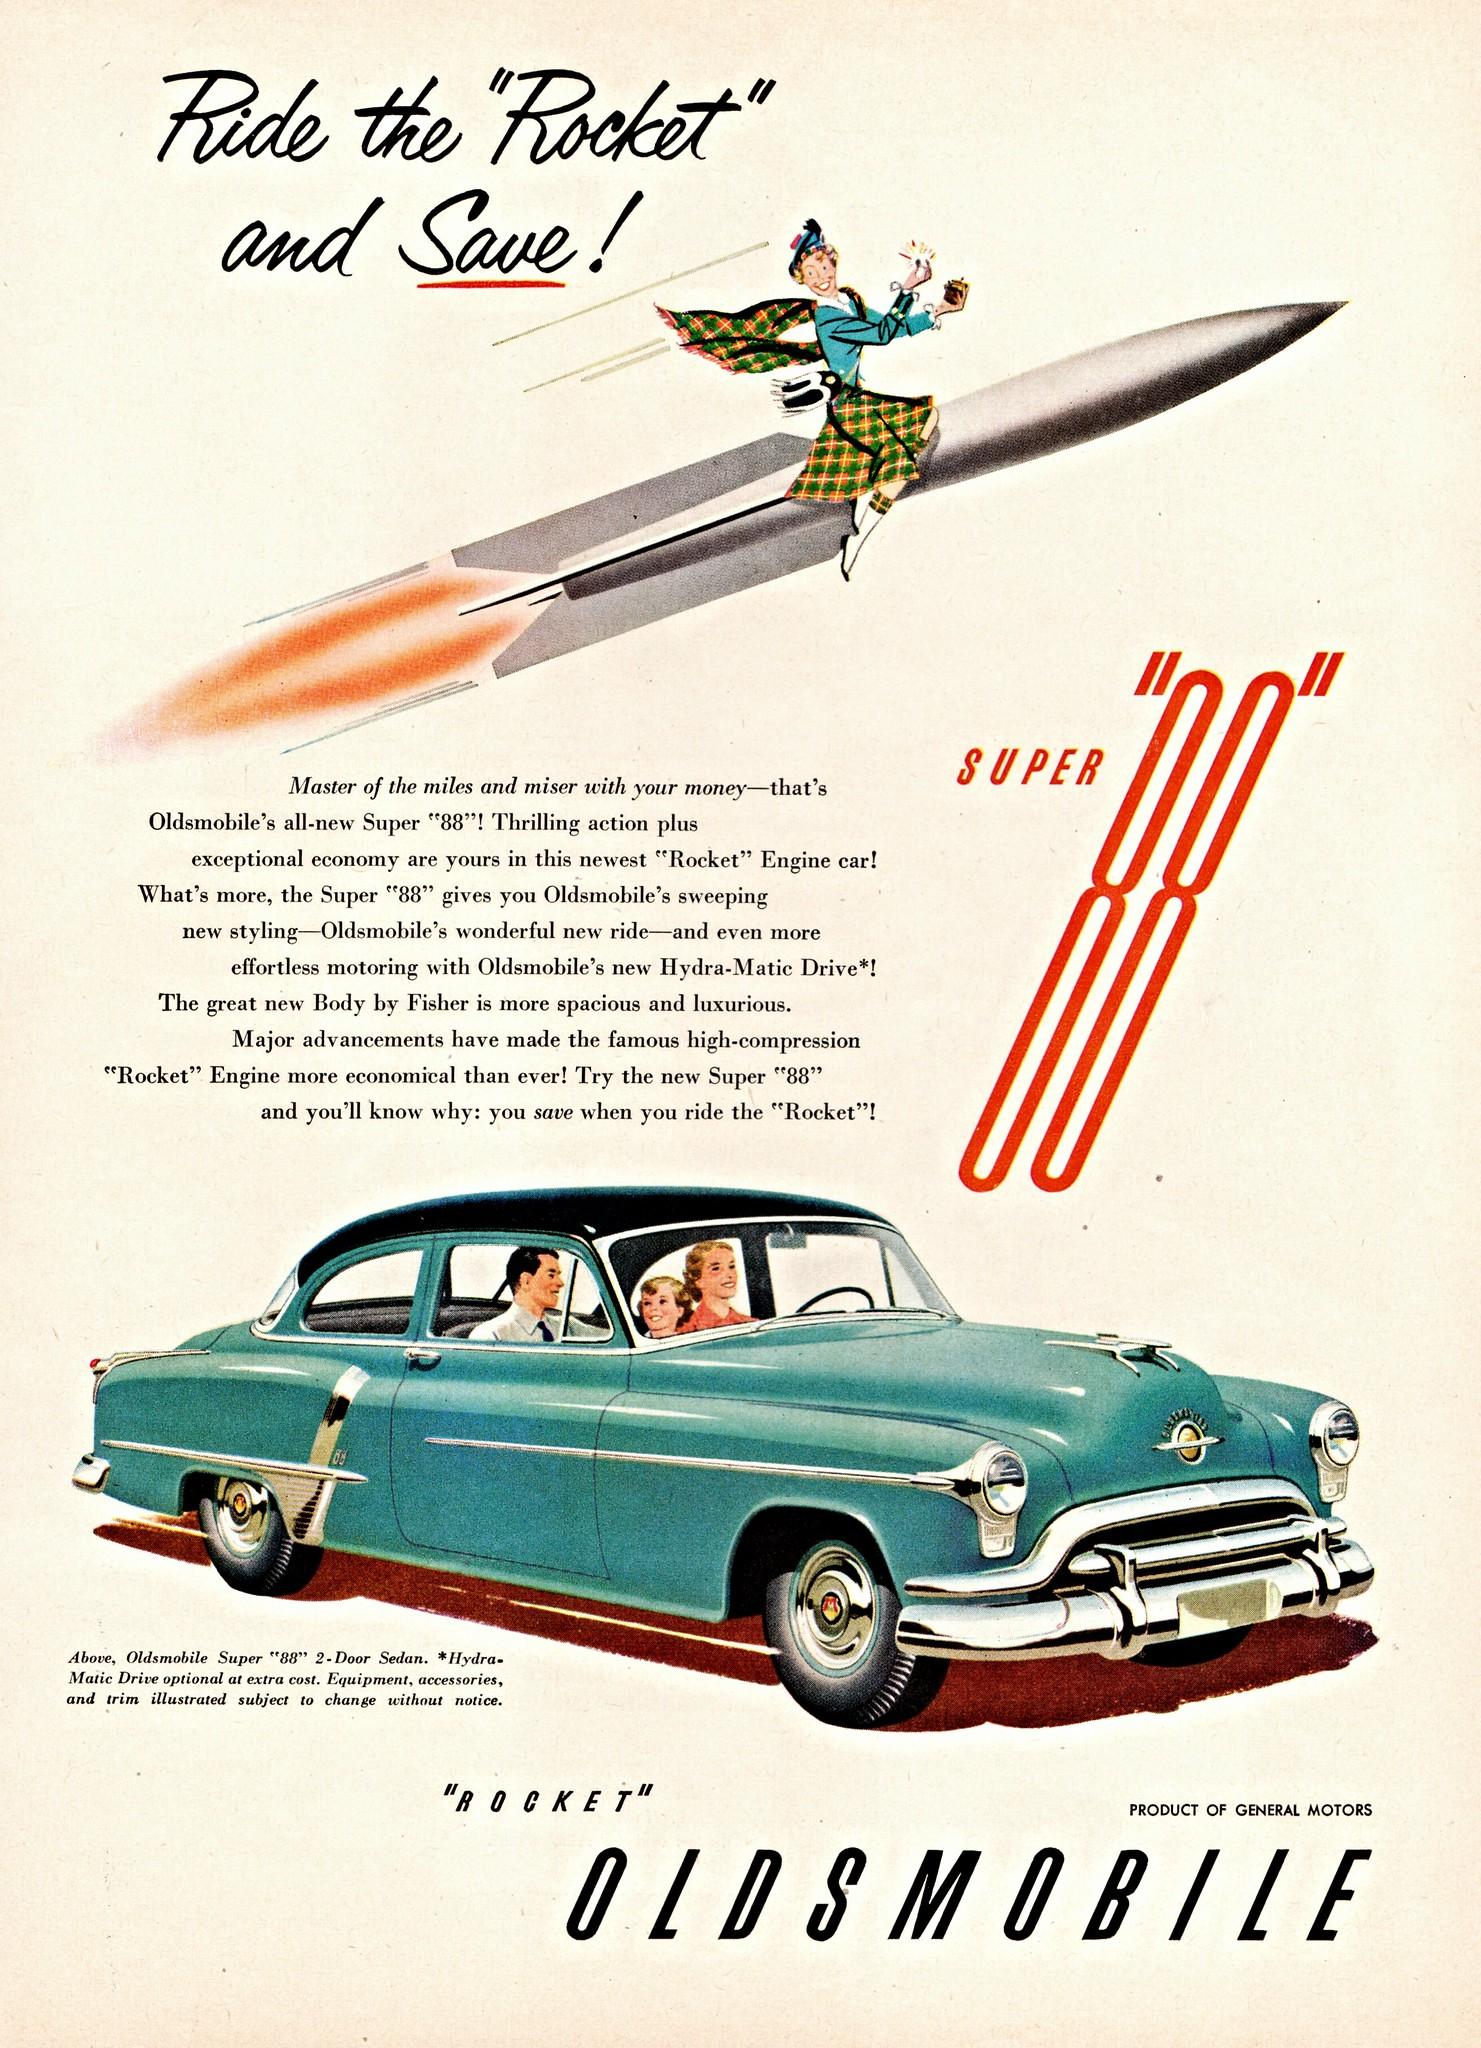 1951 Oldsmobile Super '88' 2-Door Sedan